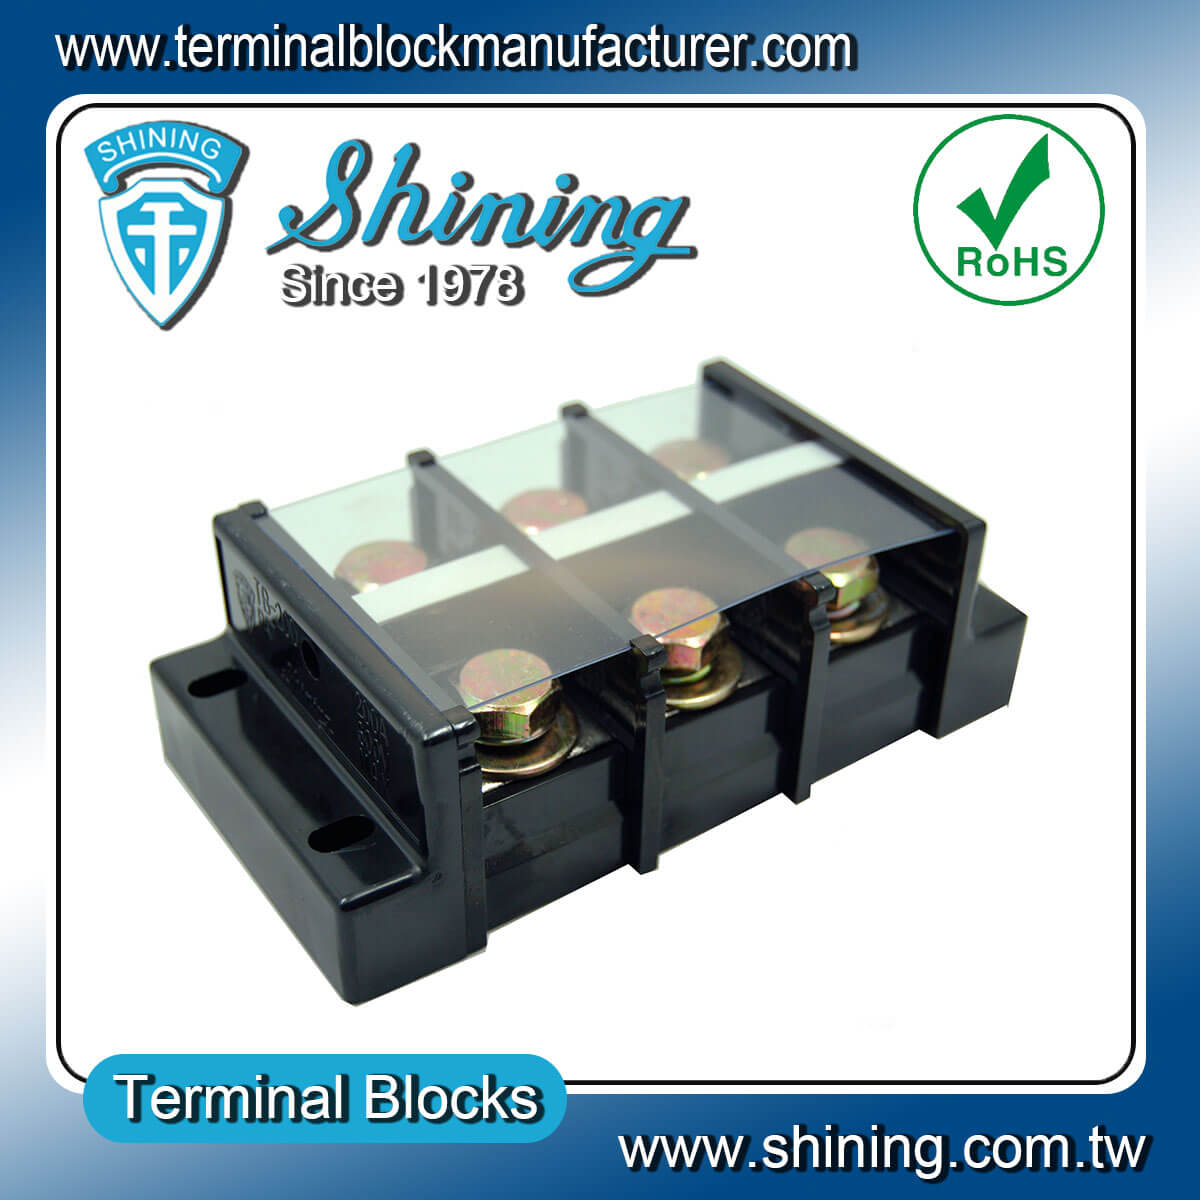 TB-200 600V 200A 組合式柵欄端子台